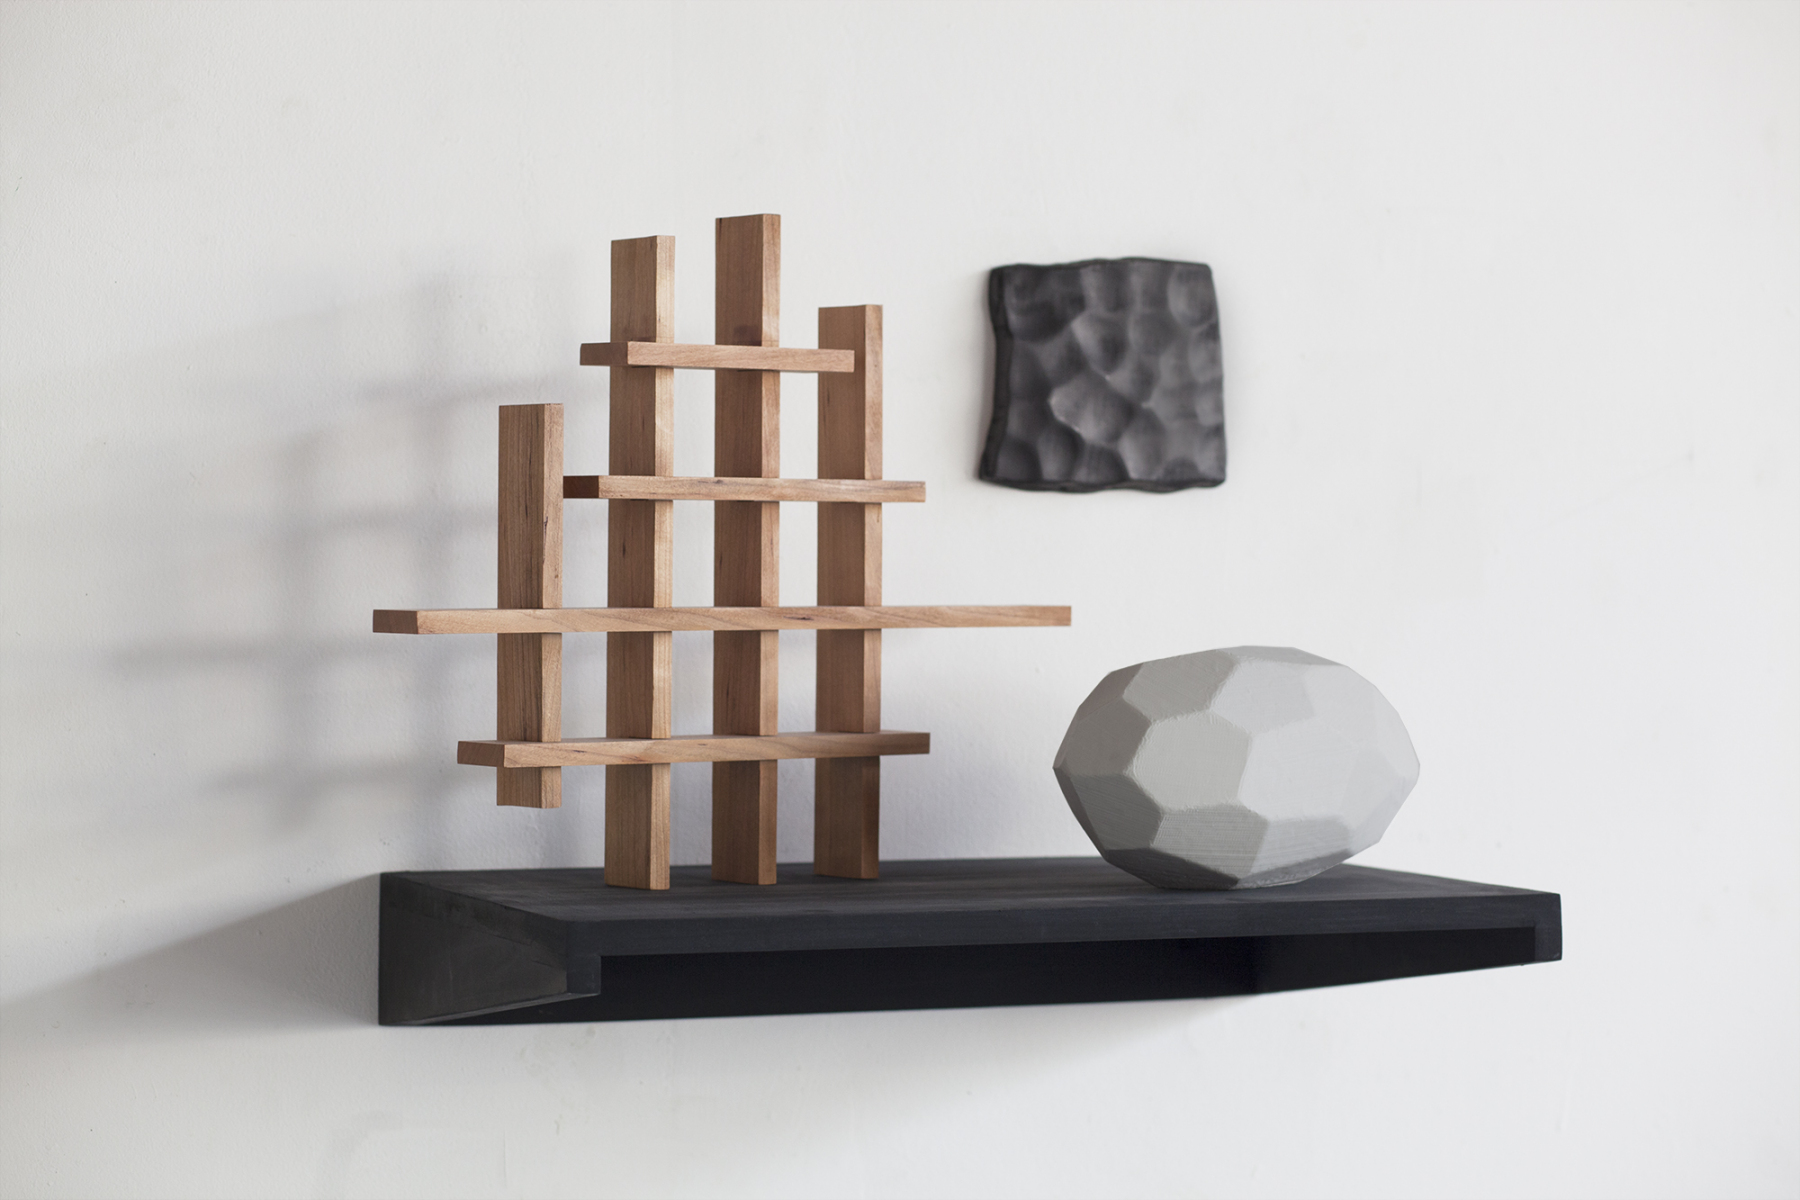 50 Objects, Still Life